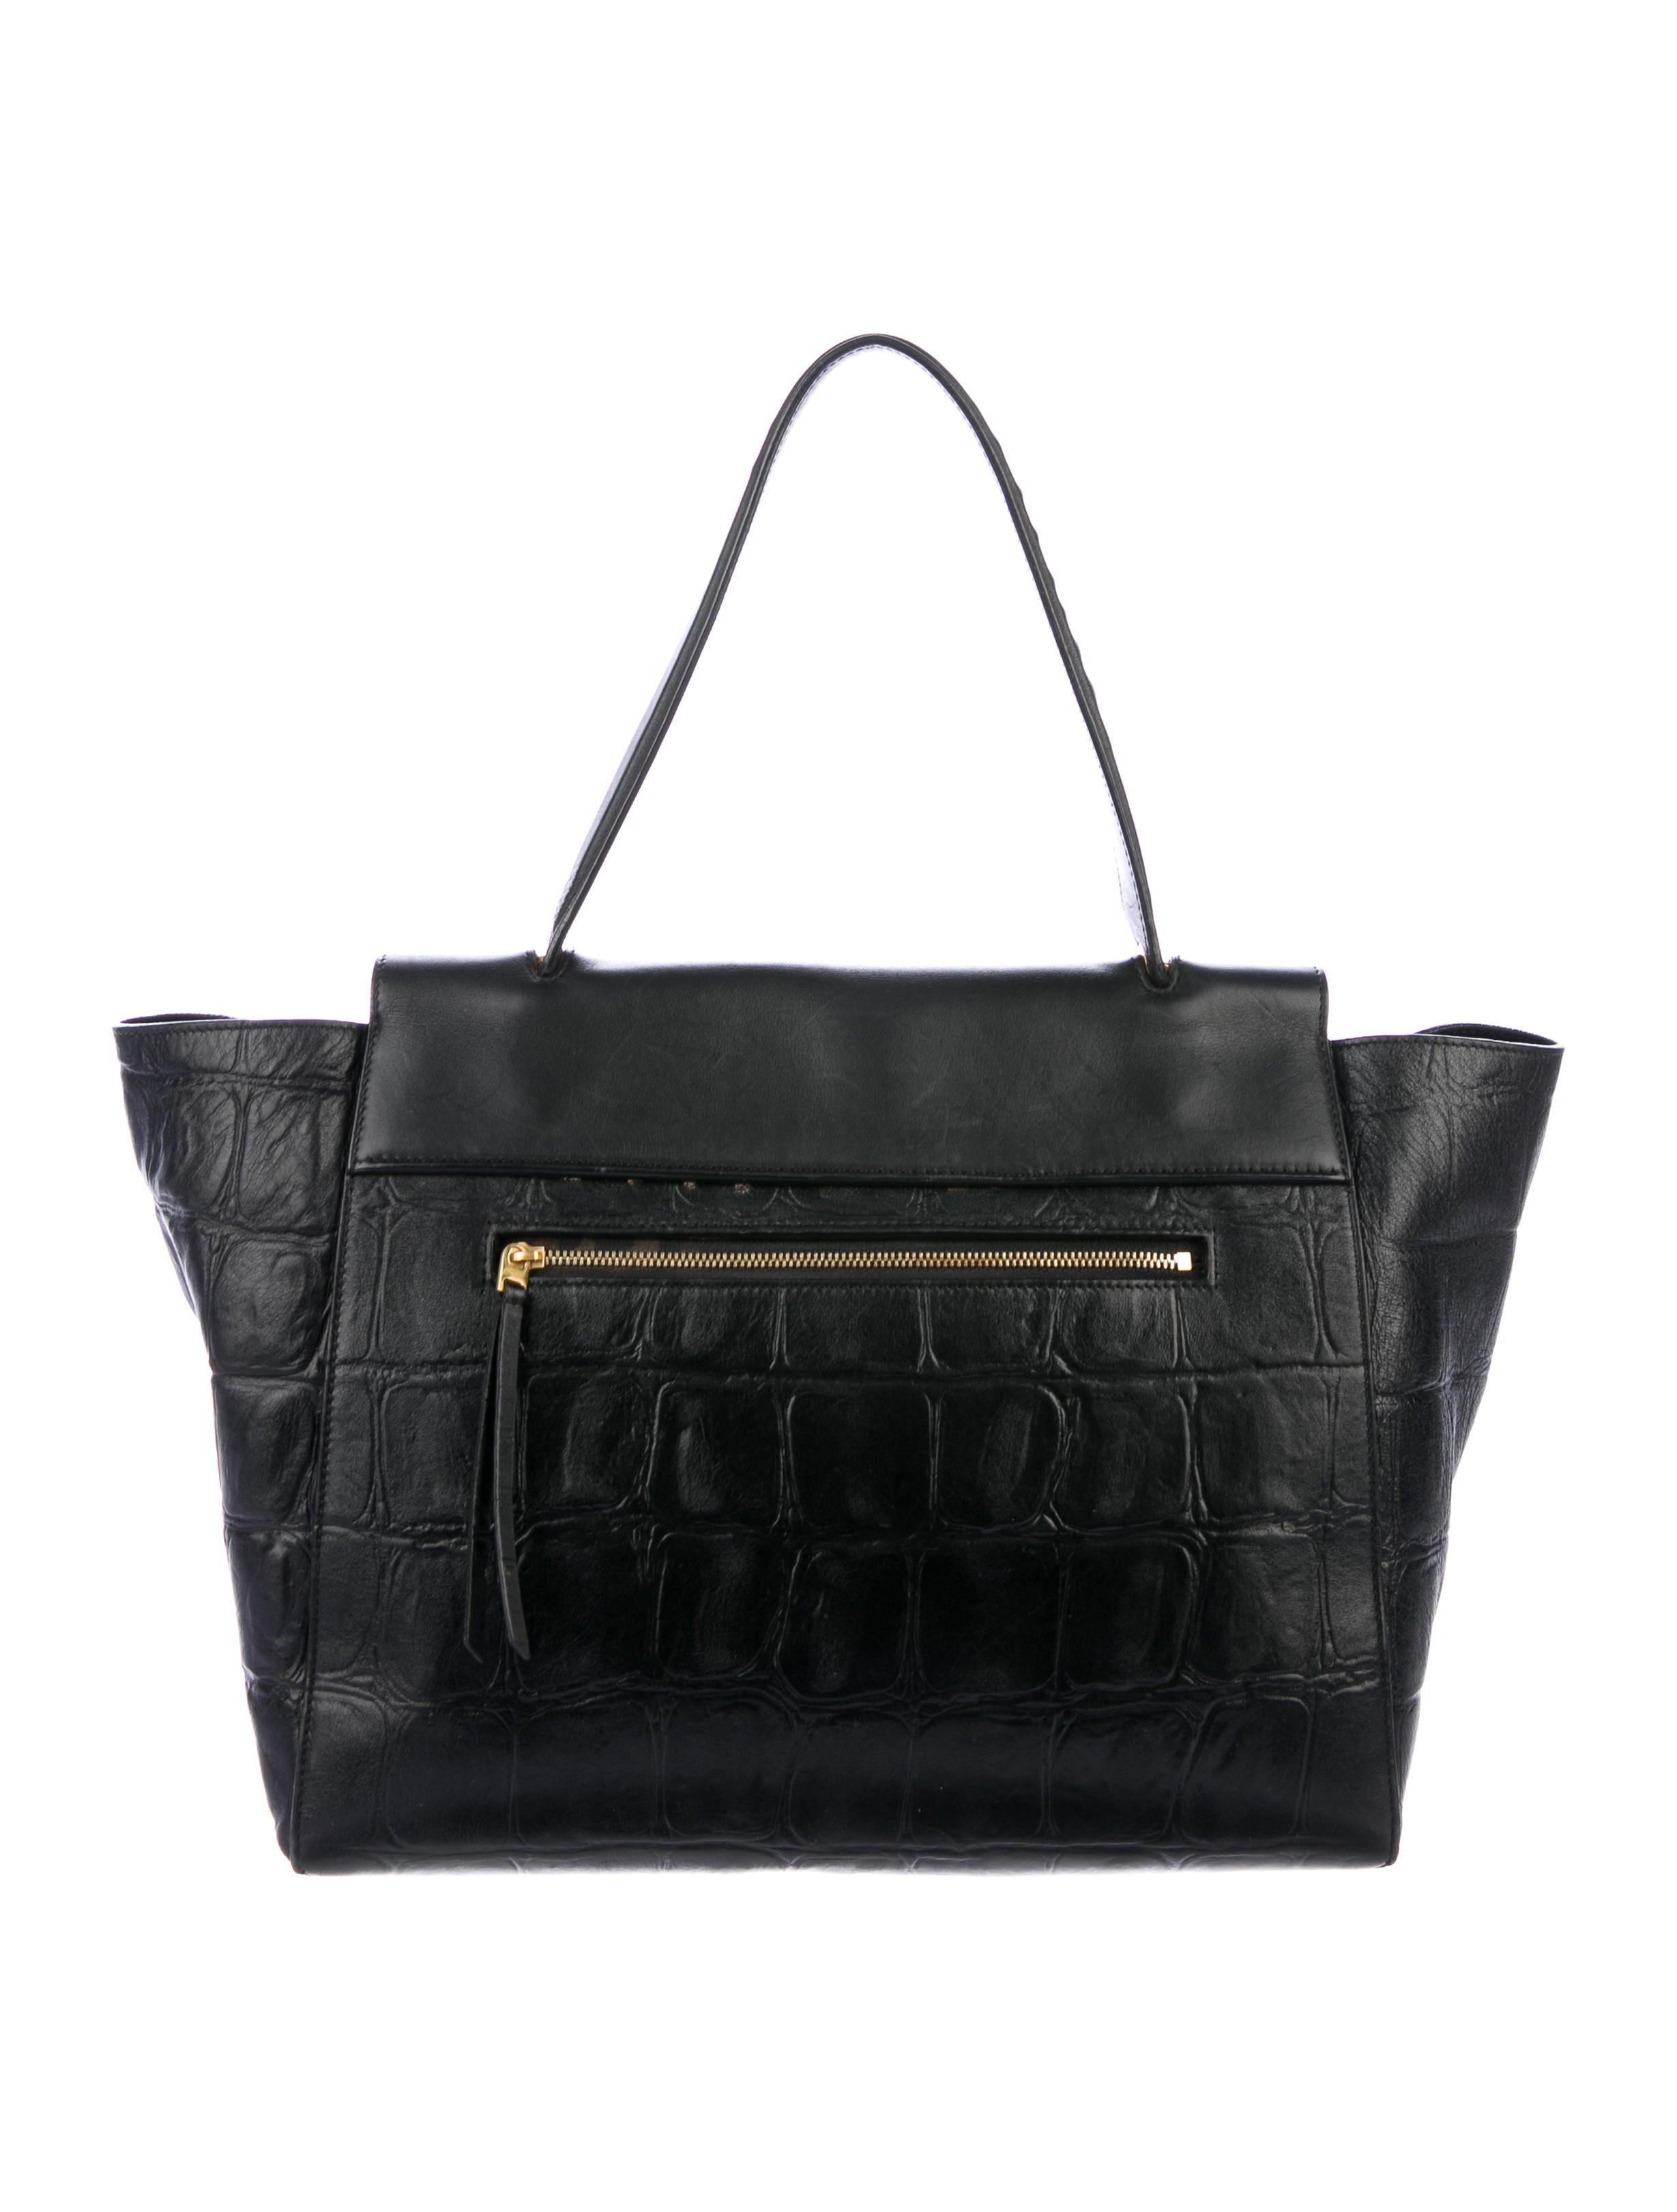 73ceda0d1d7 ... Belt Bag Céline Céline Embossed Embossed Medium xqCgRIffw4 ...